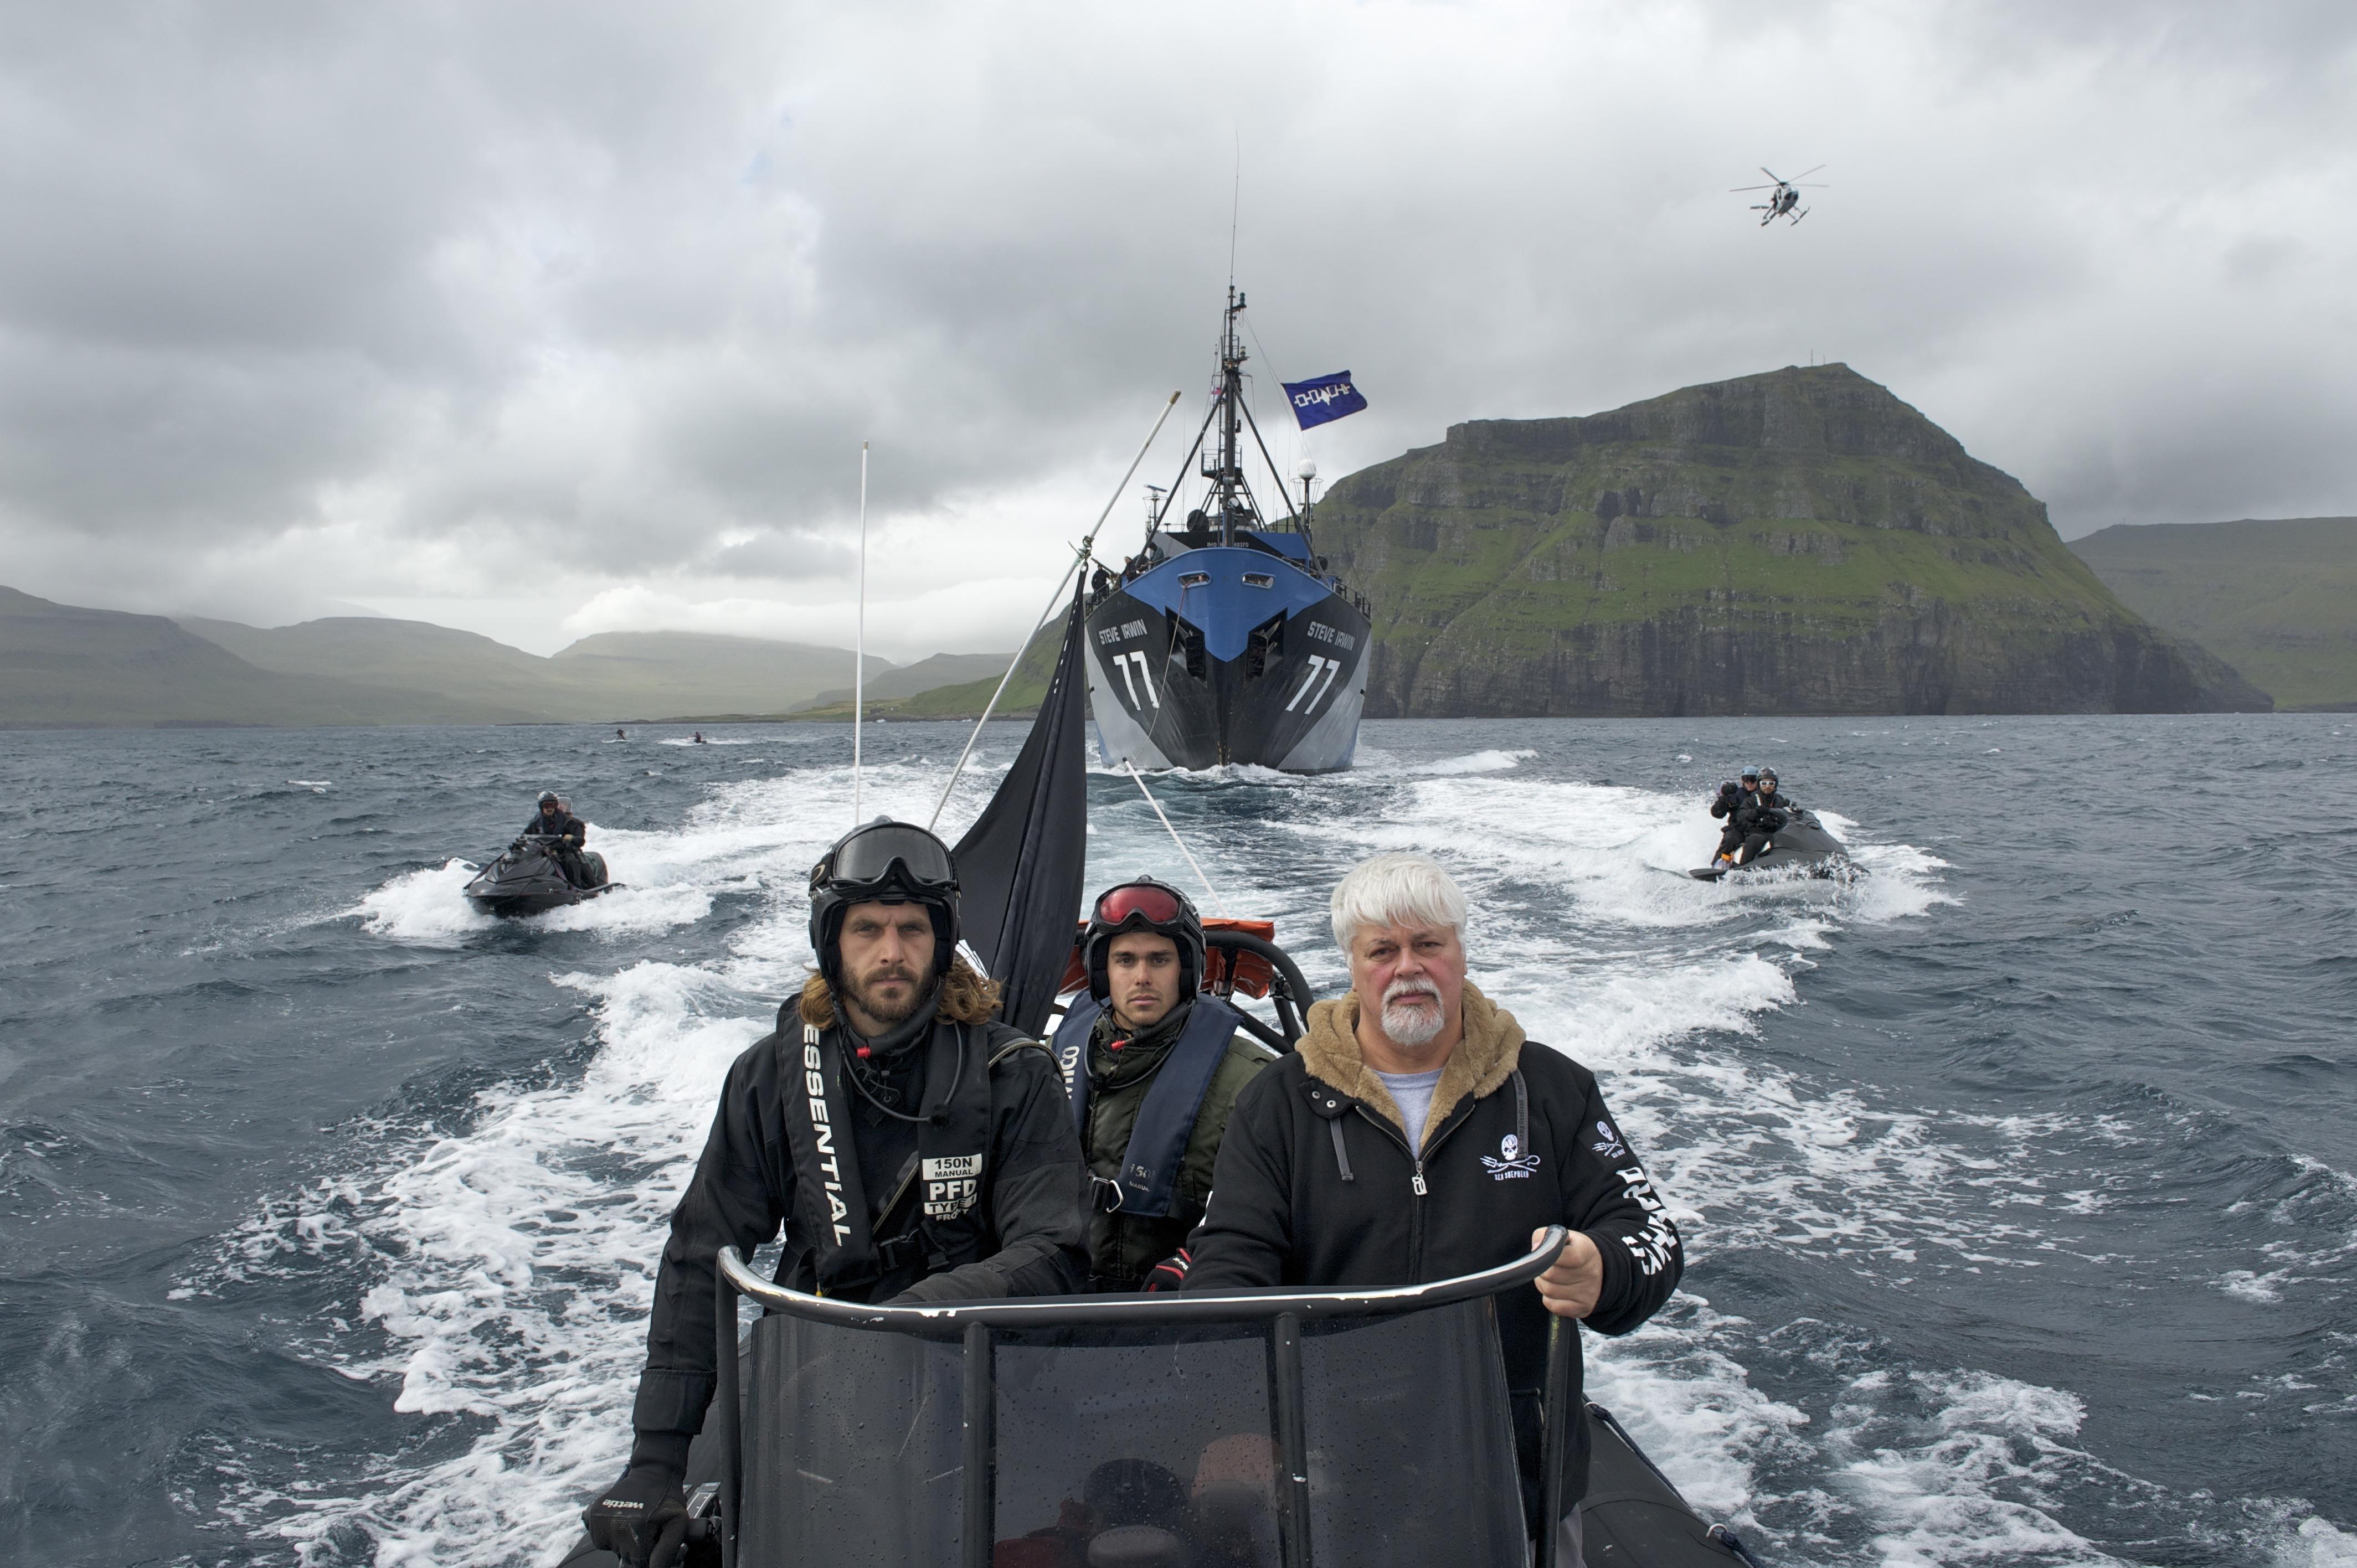 Paul Watson and his crew